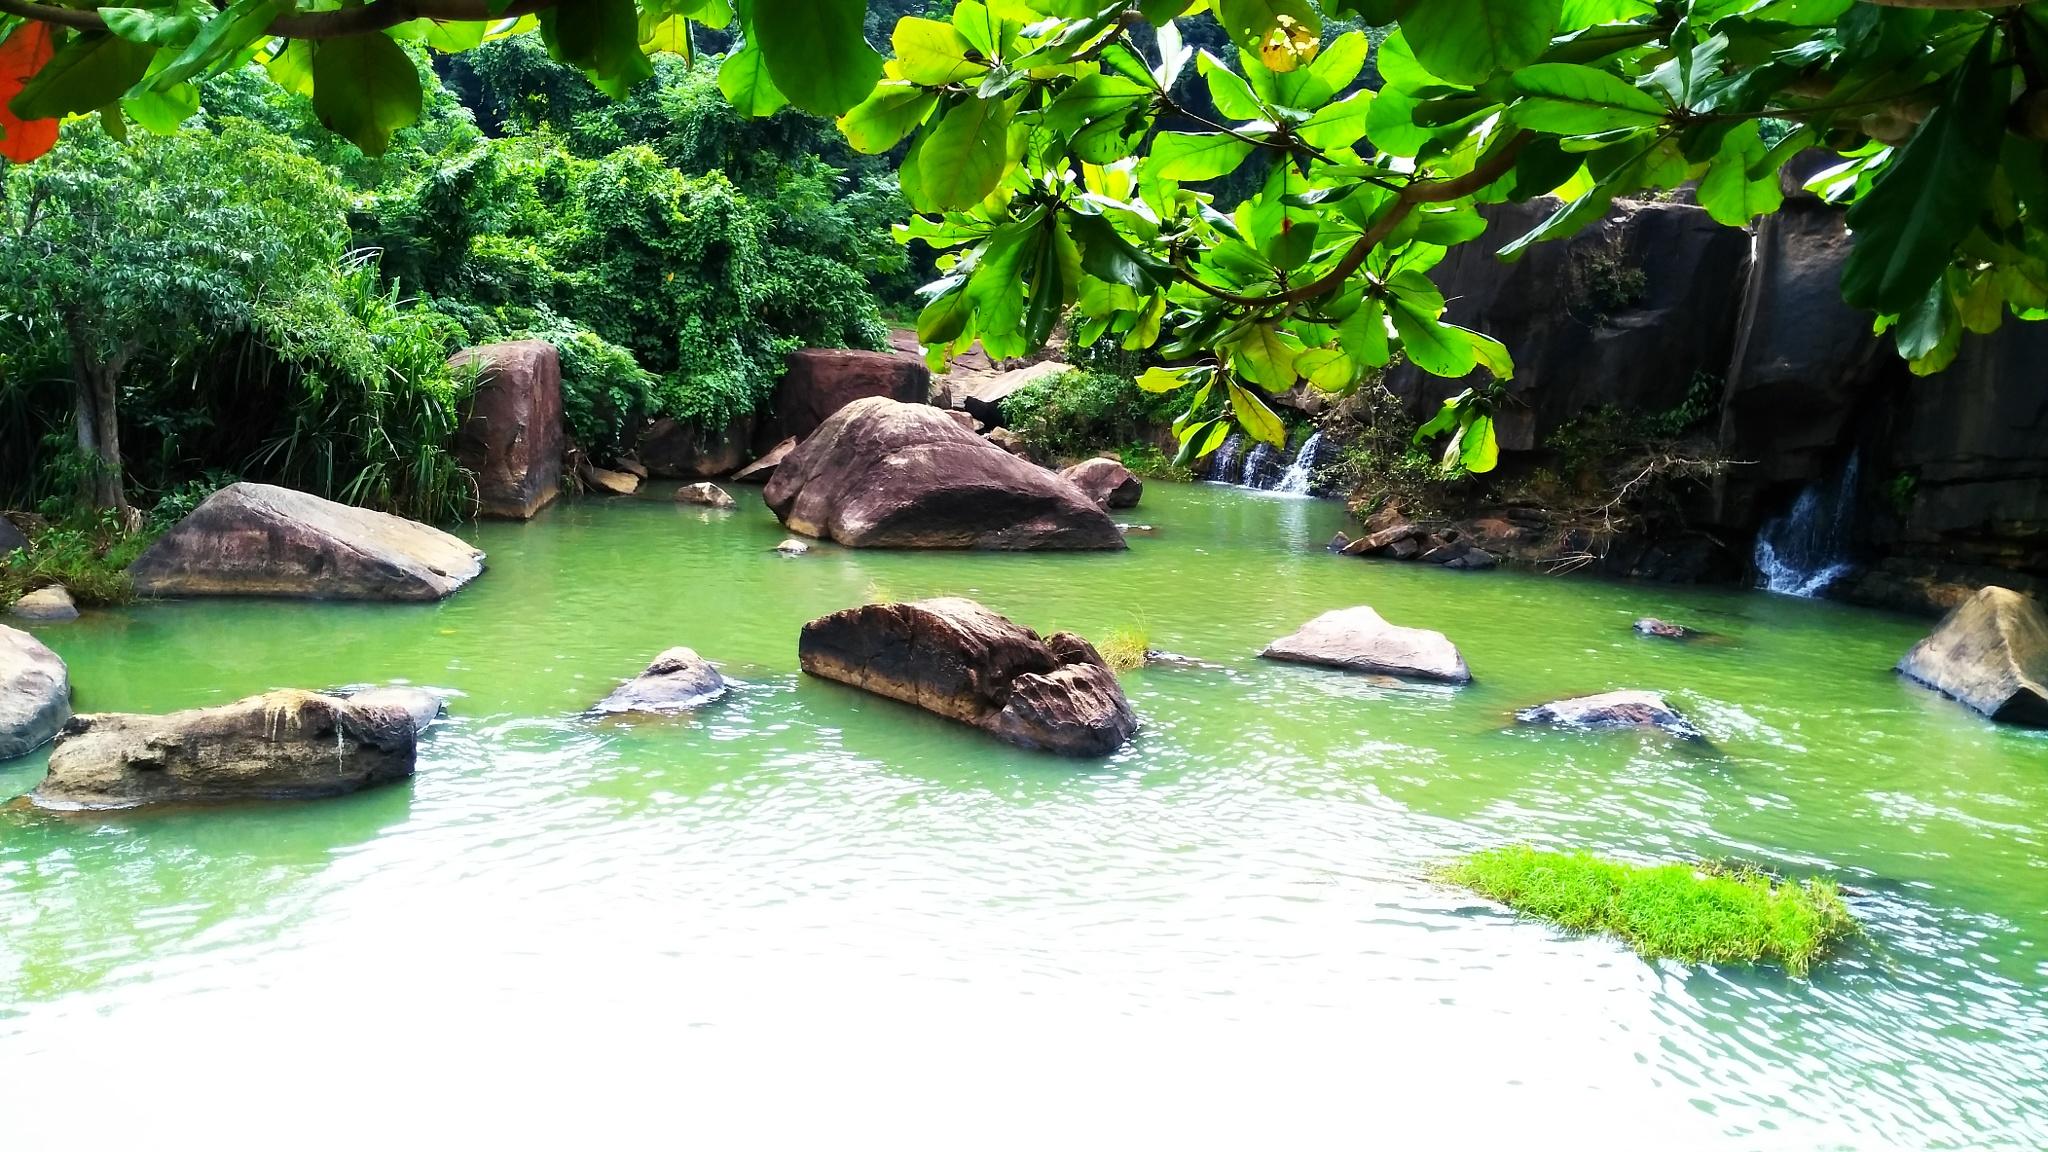 Forbidden Paradise by Ashwin